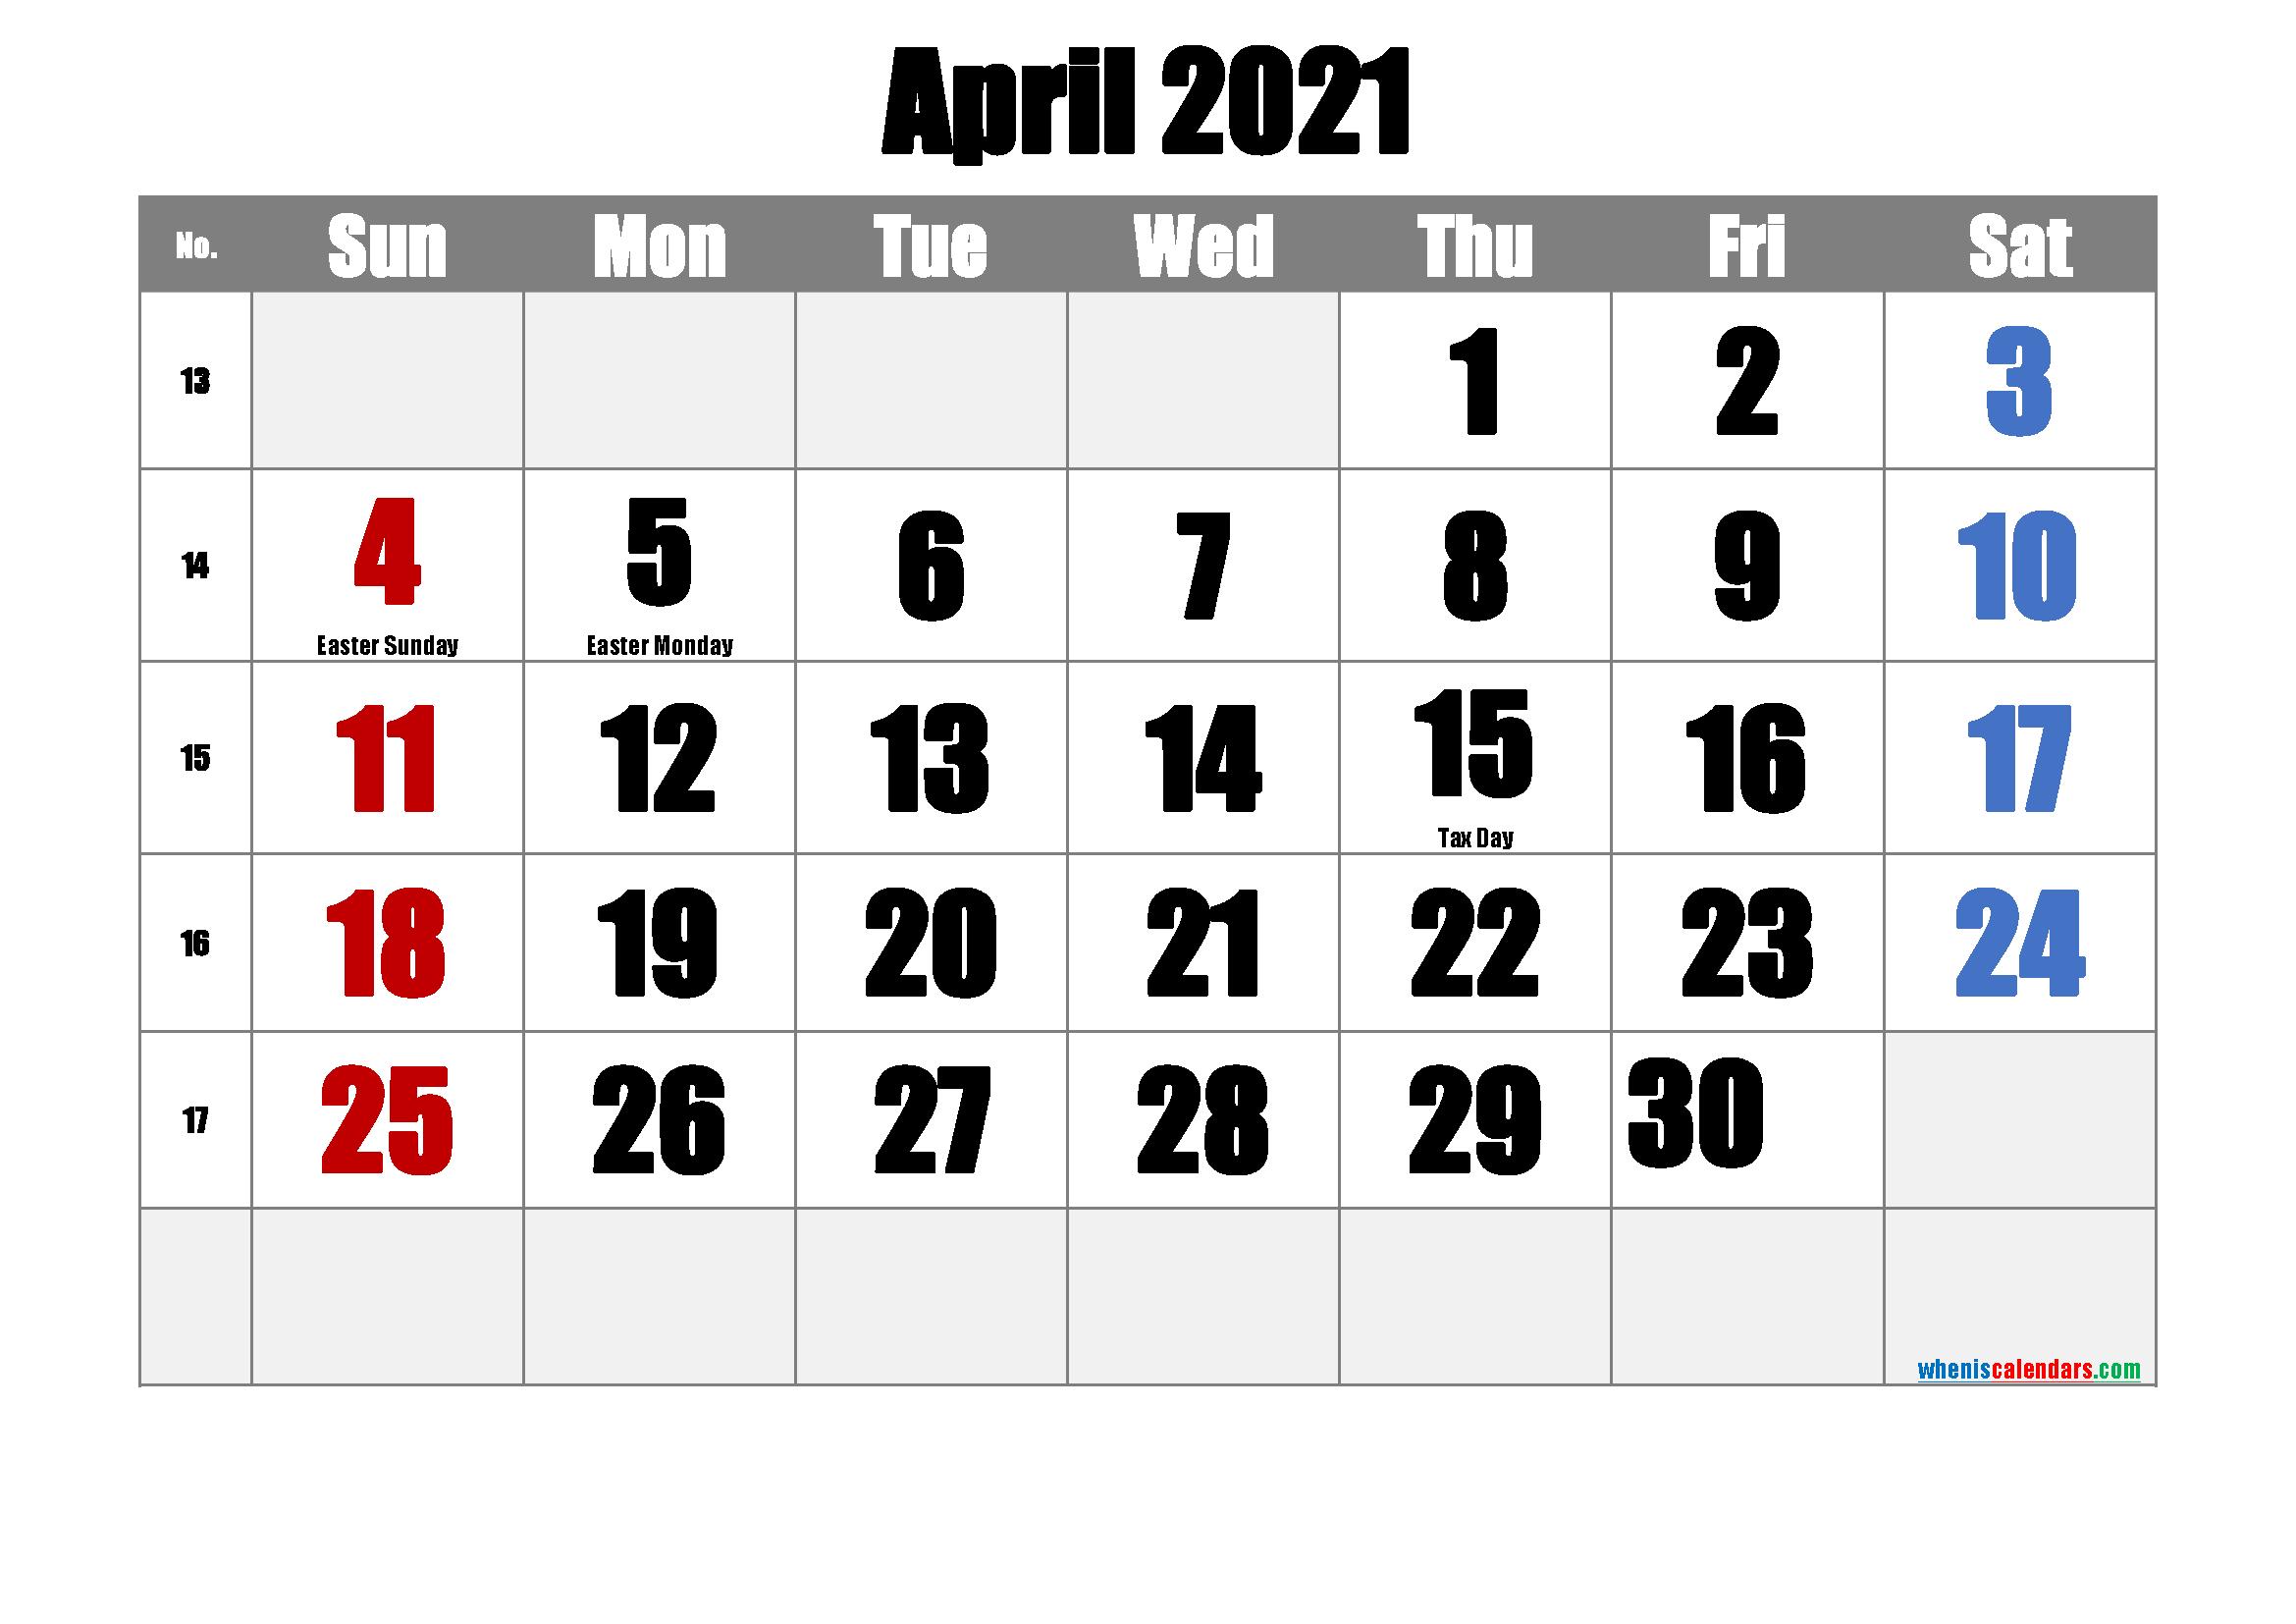 Free Printable April 2021 Calendar In 2020 | Free Printable